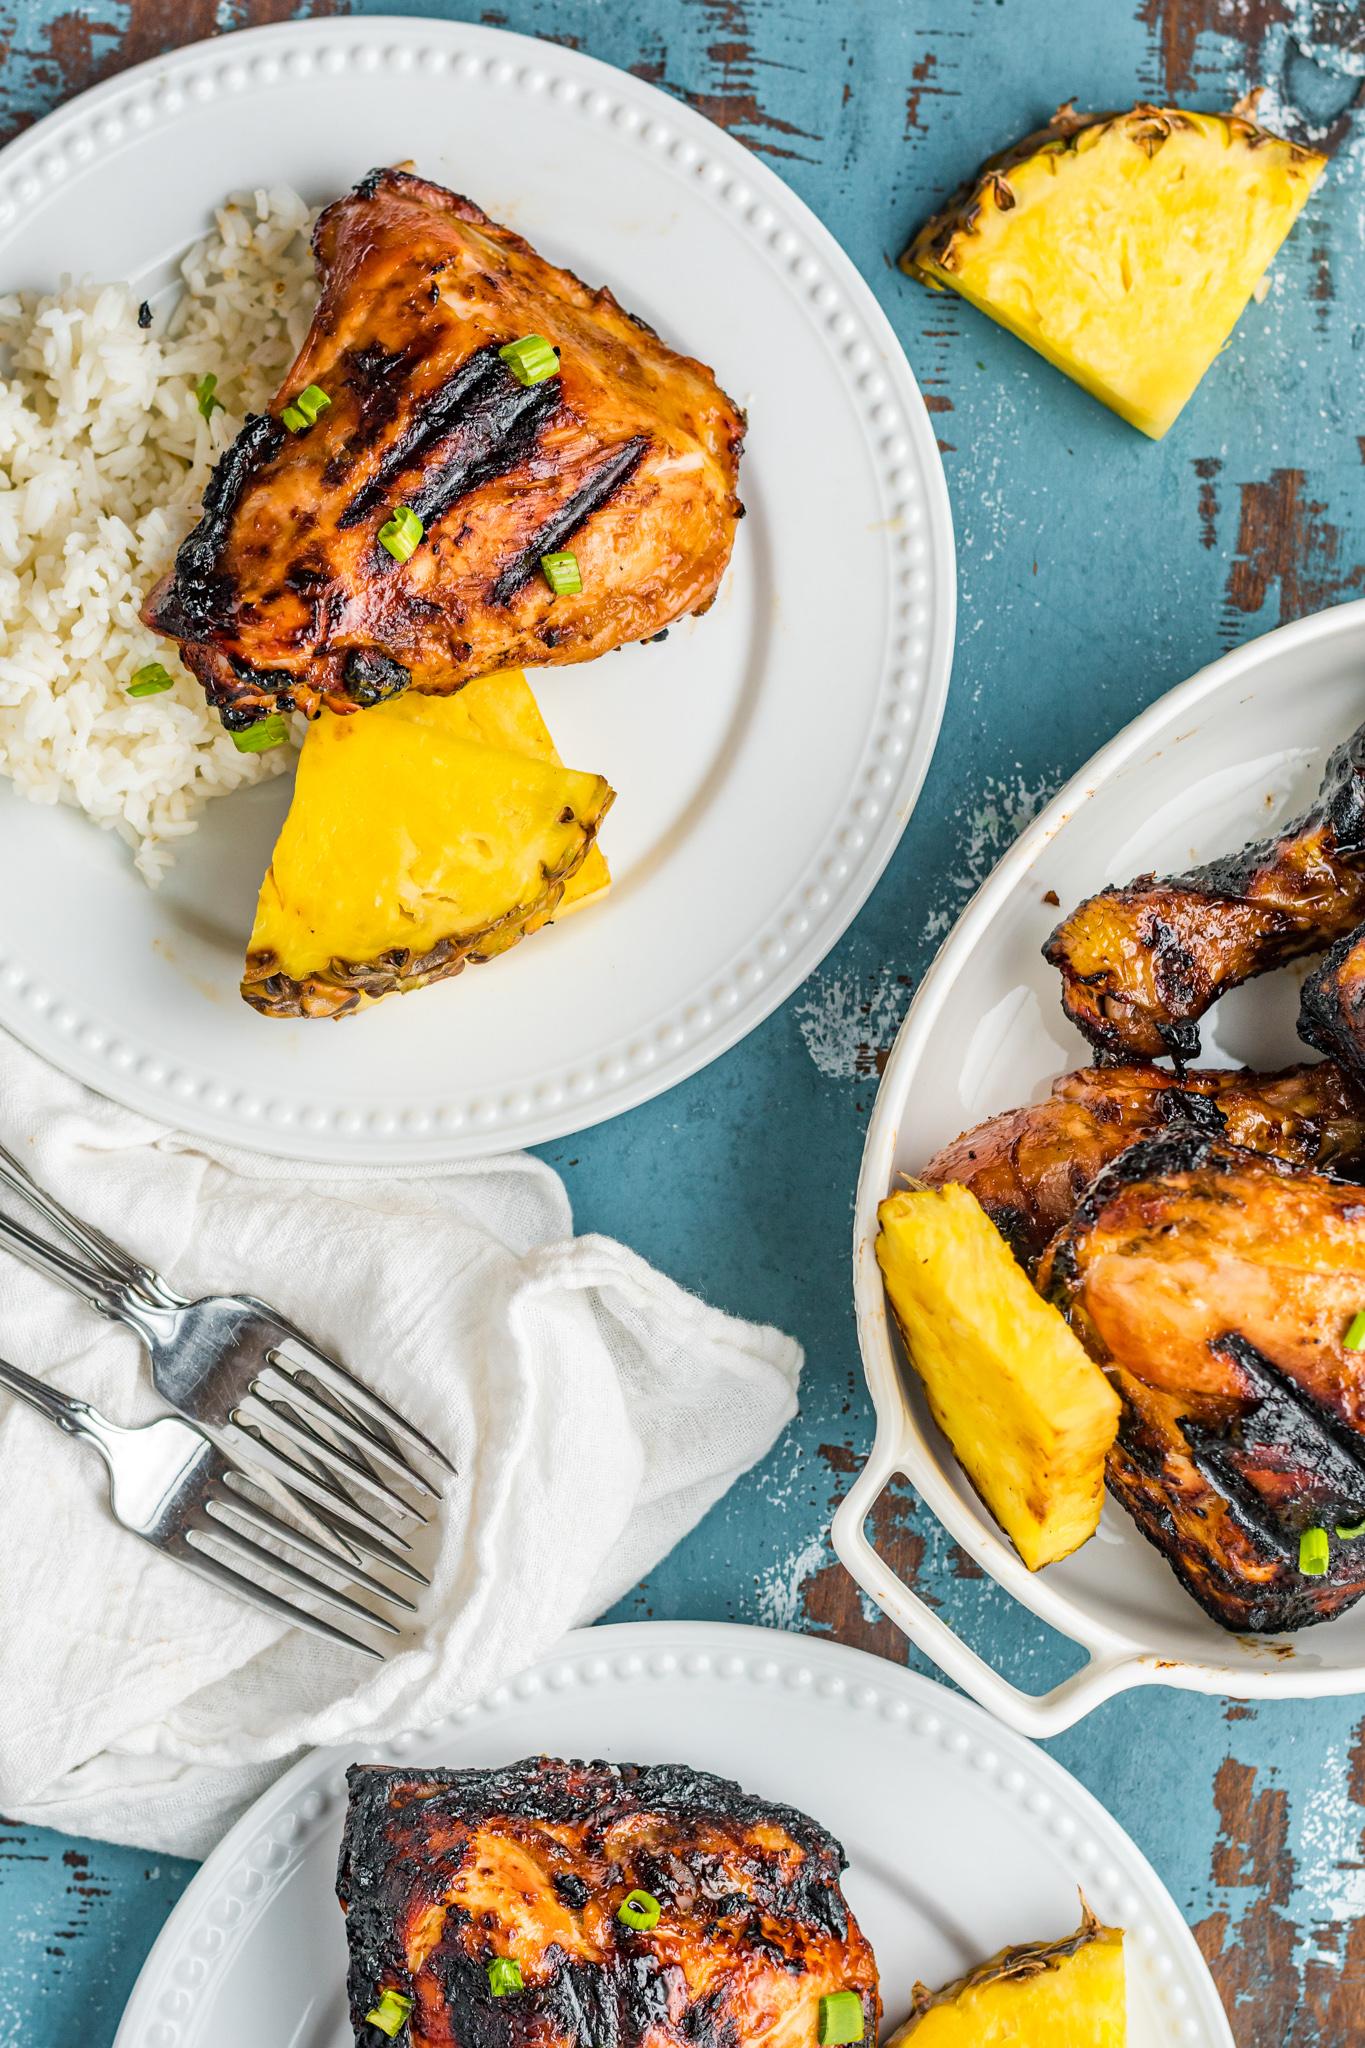 Grilled Huli Huli Chicken on white plates.